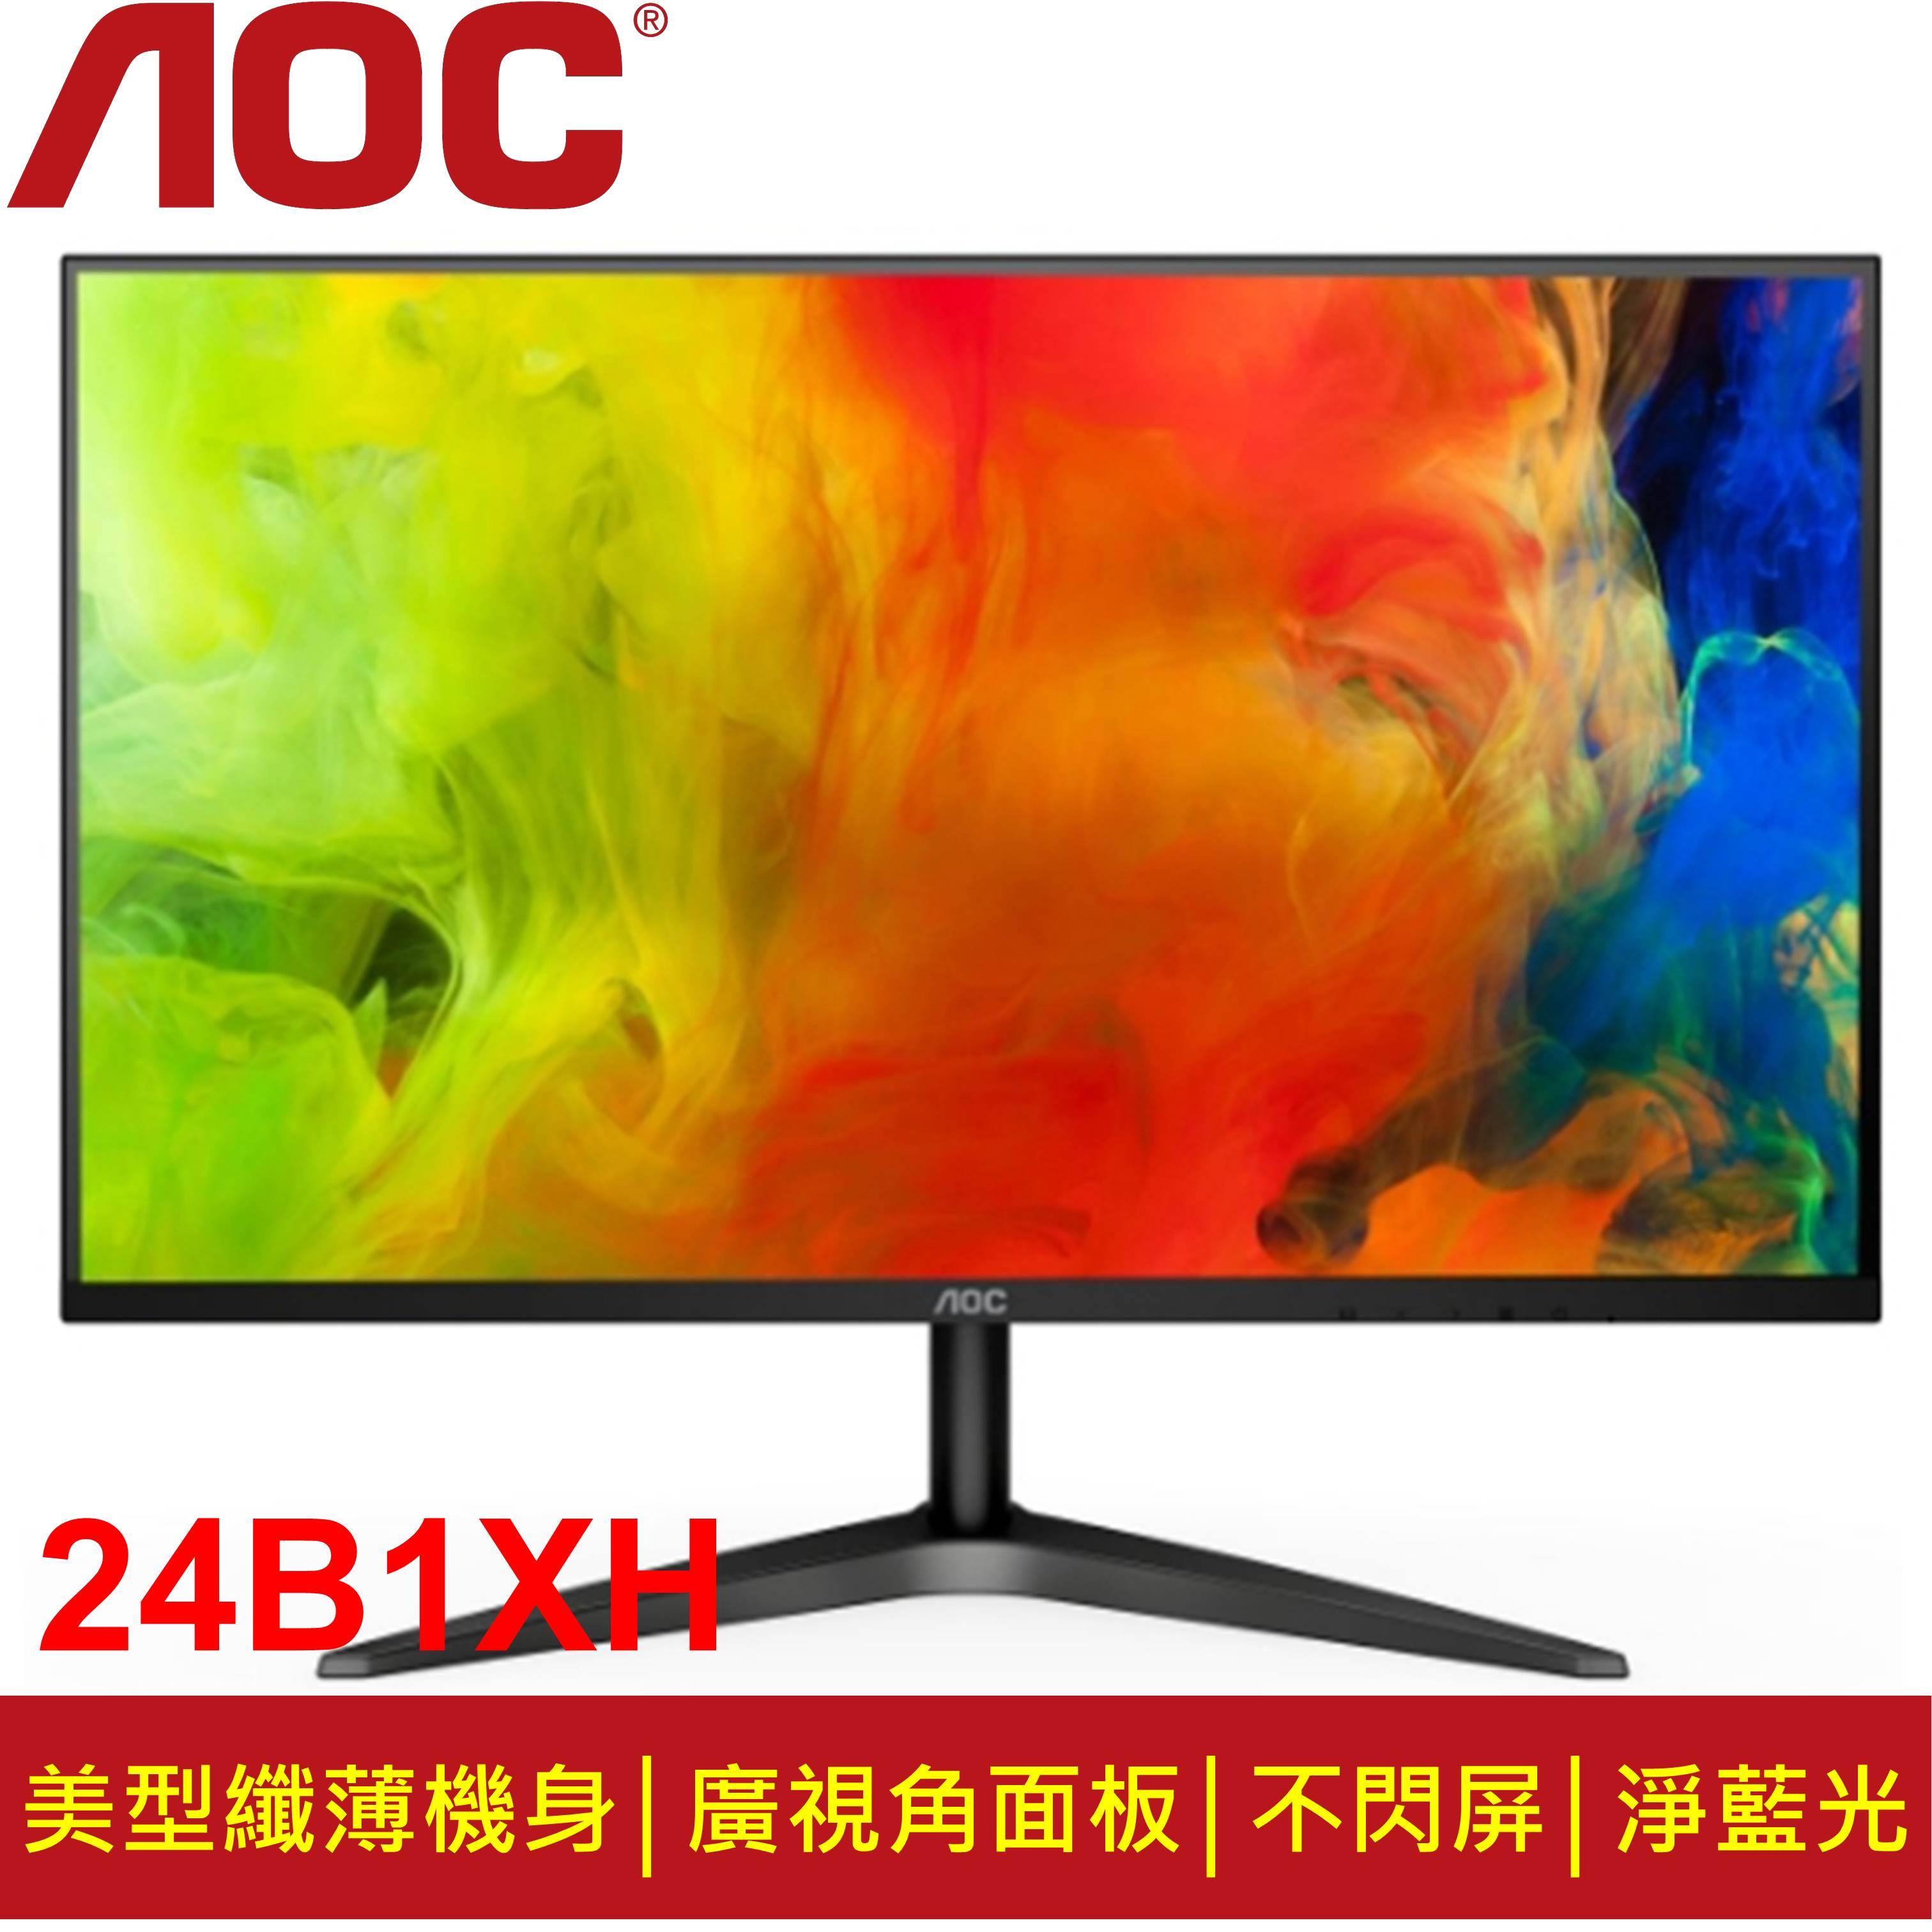 AOC 24B1XH 24型IPS寬螢幕